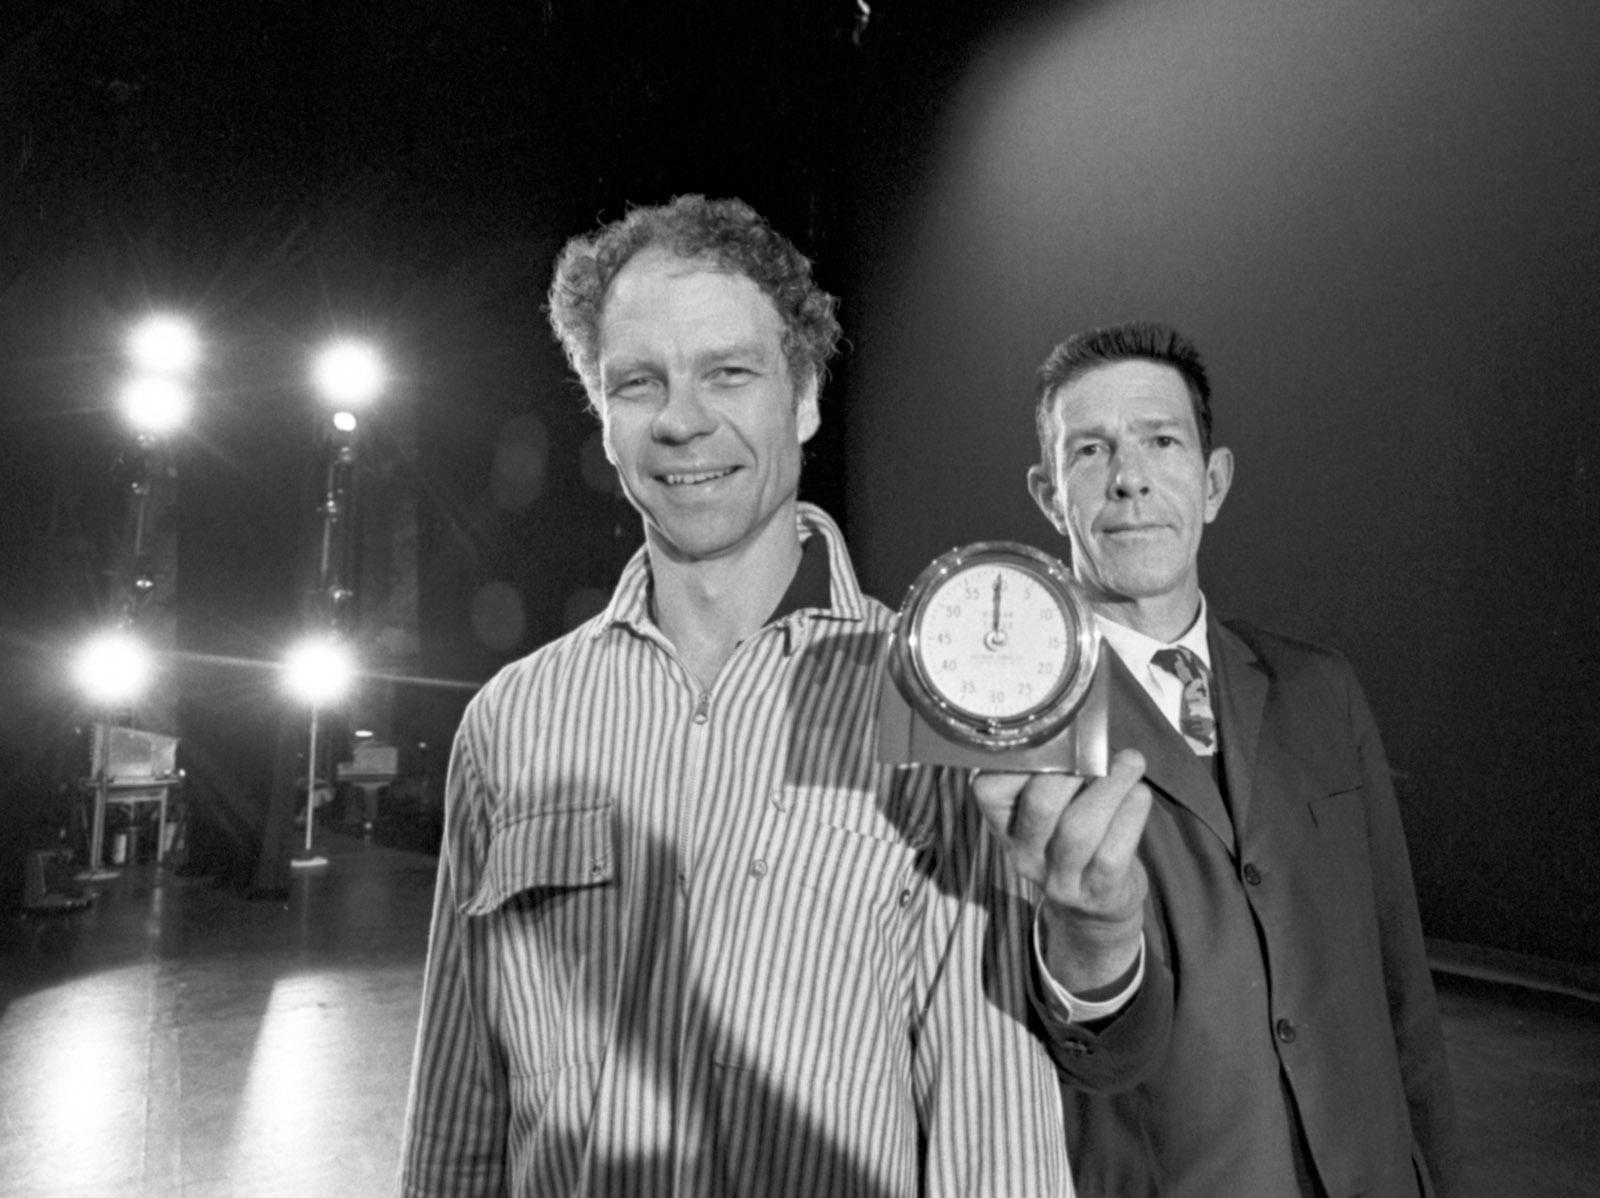 Merce Cunningham and John Cage, 1963